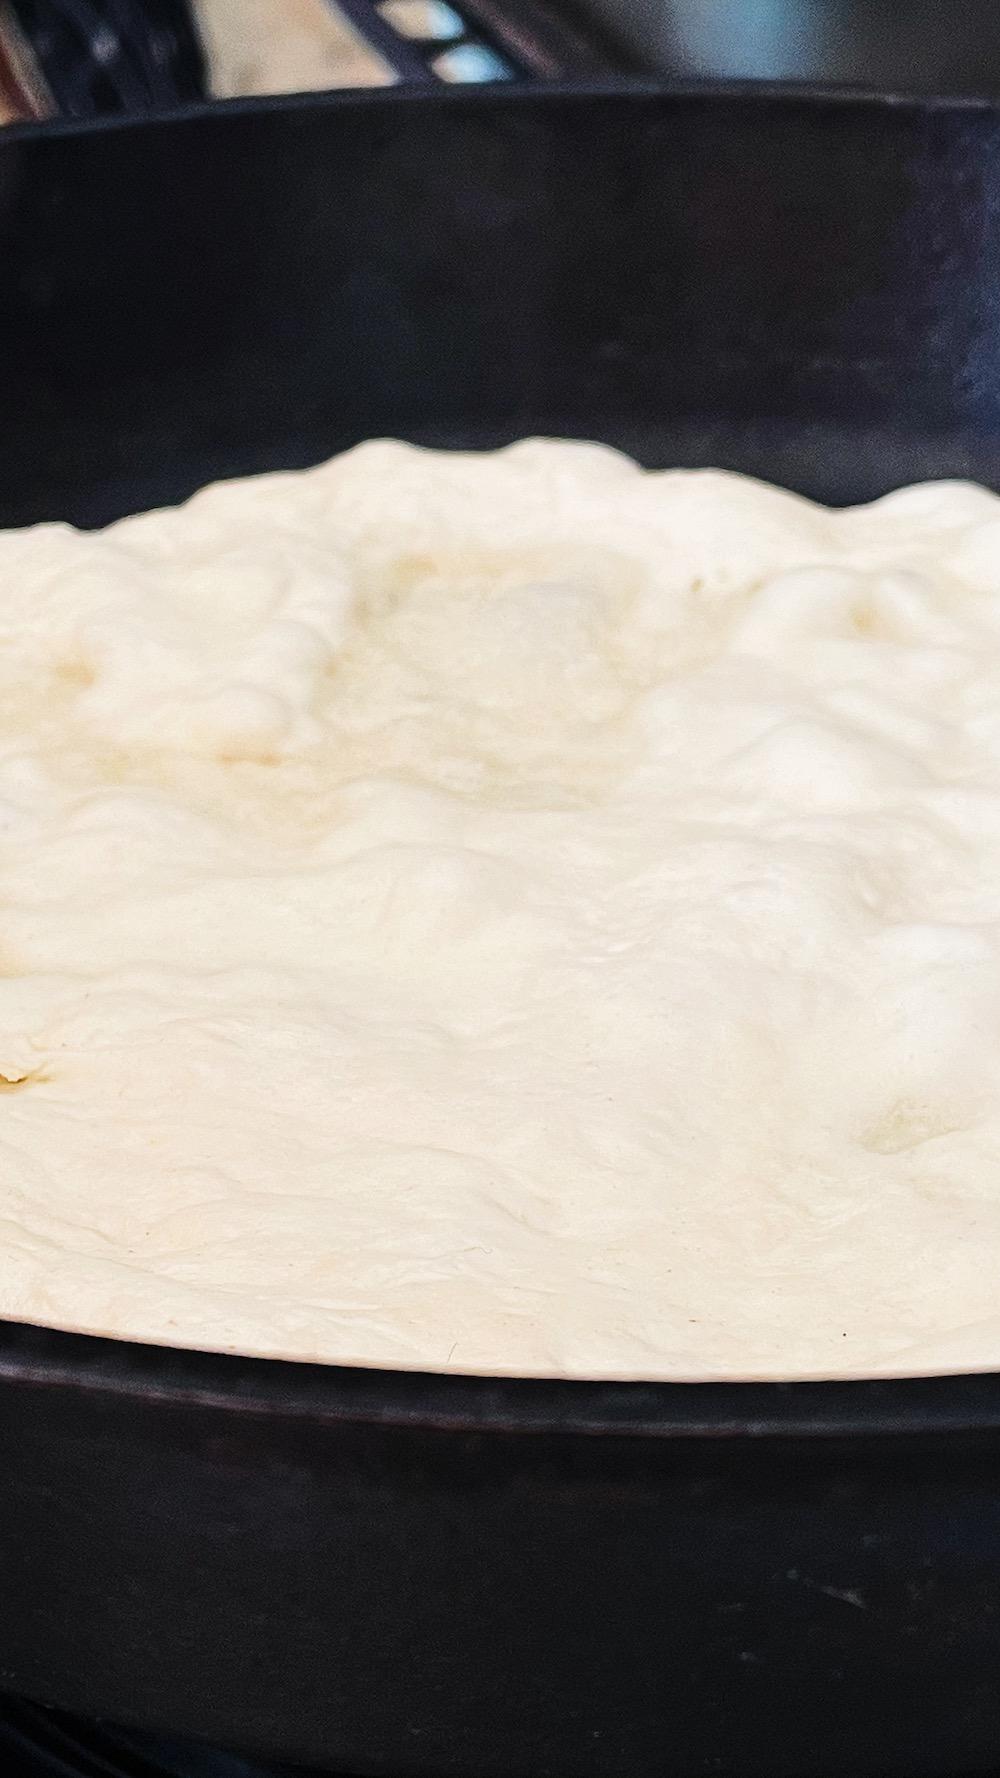 Italian pizza cast-iron skillet cooking